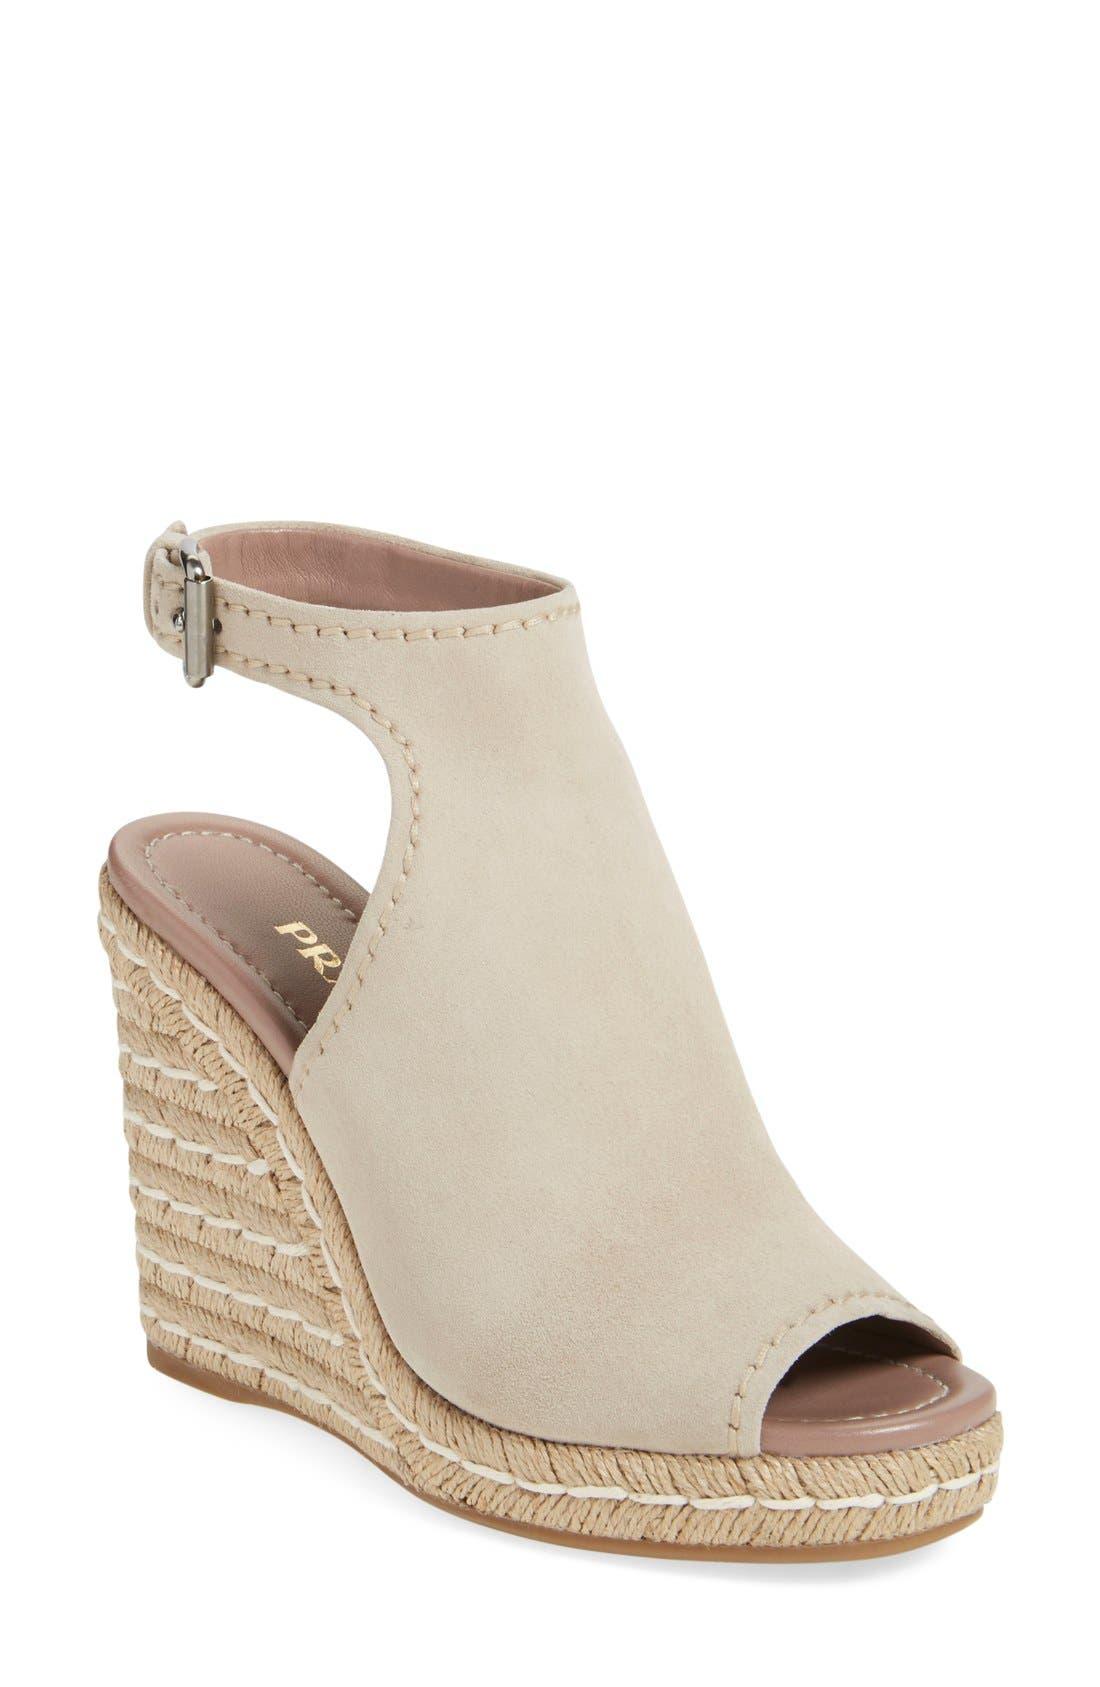 Ankle Strap Espadrille Wedge Sandal,                             Main thumbnail 1, color,                             250